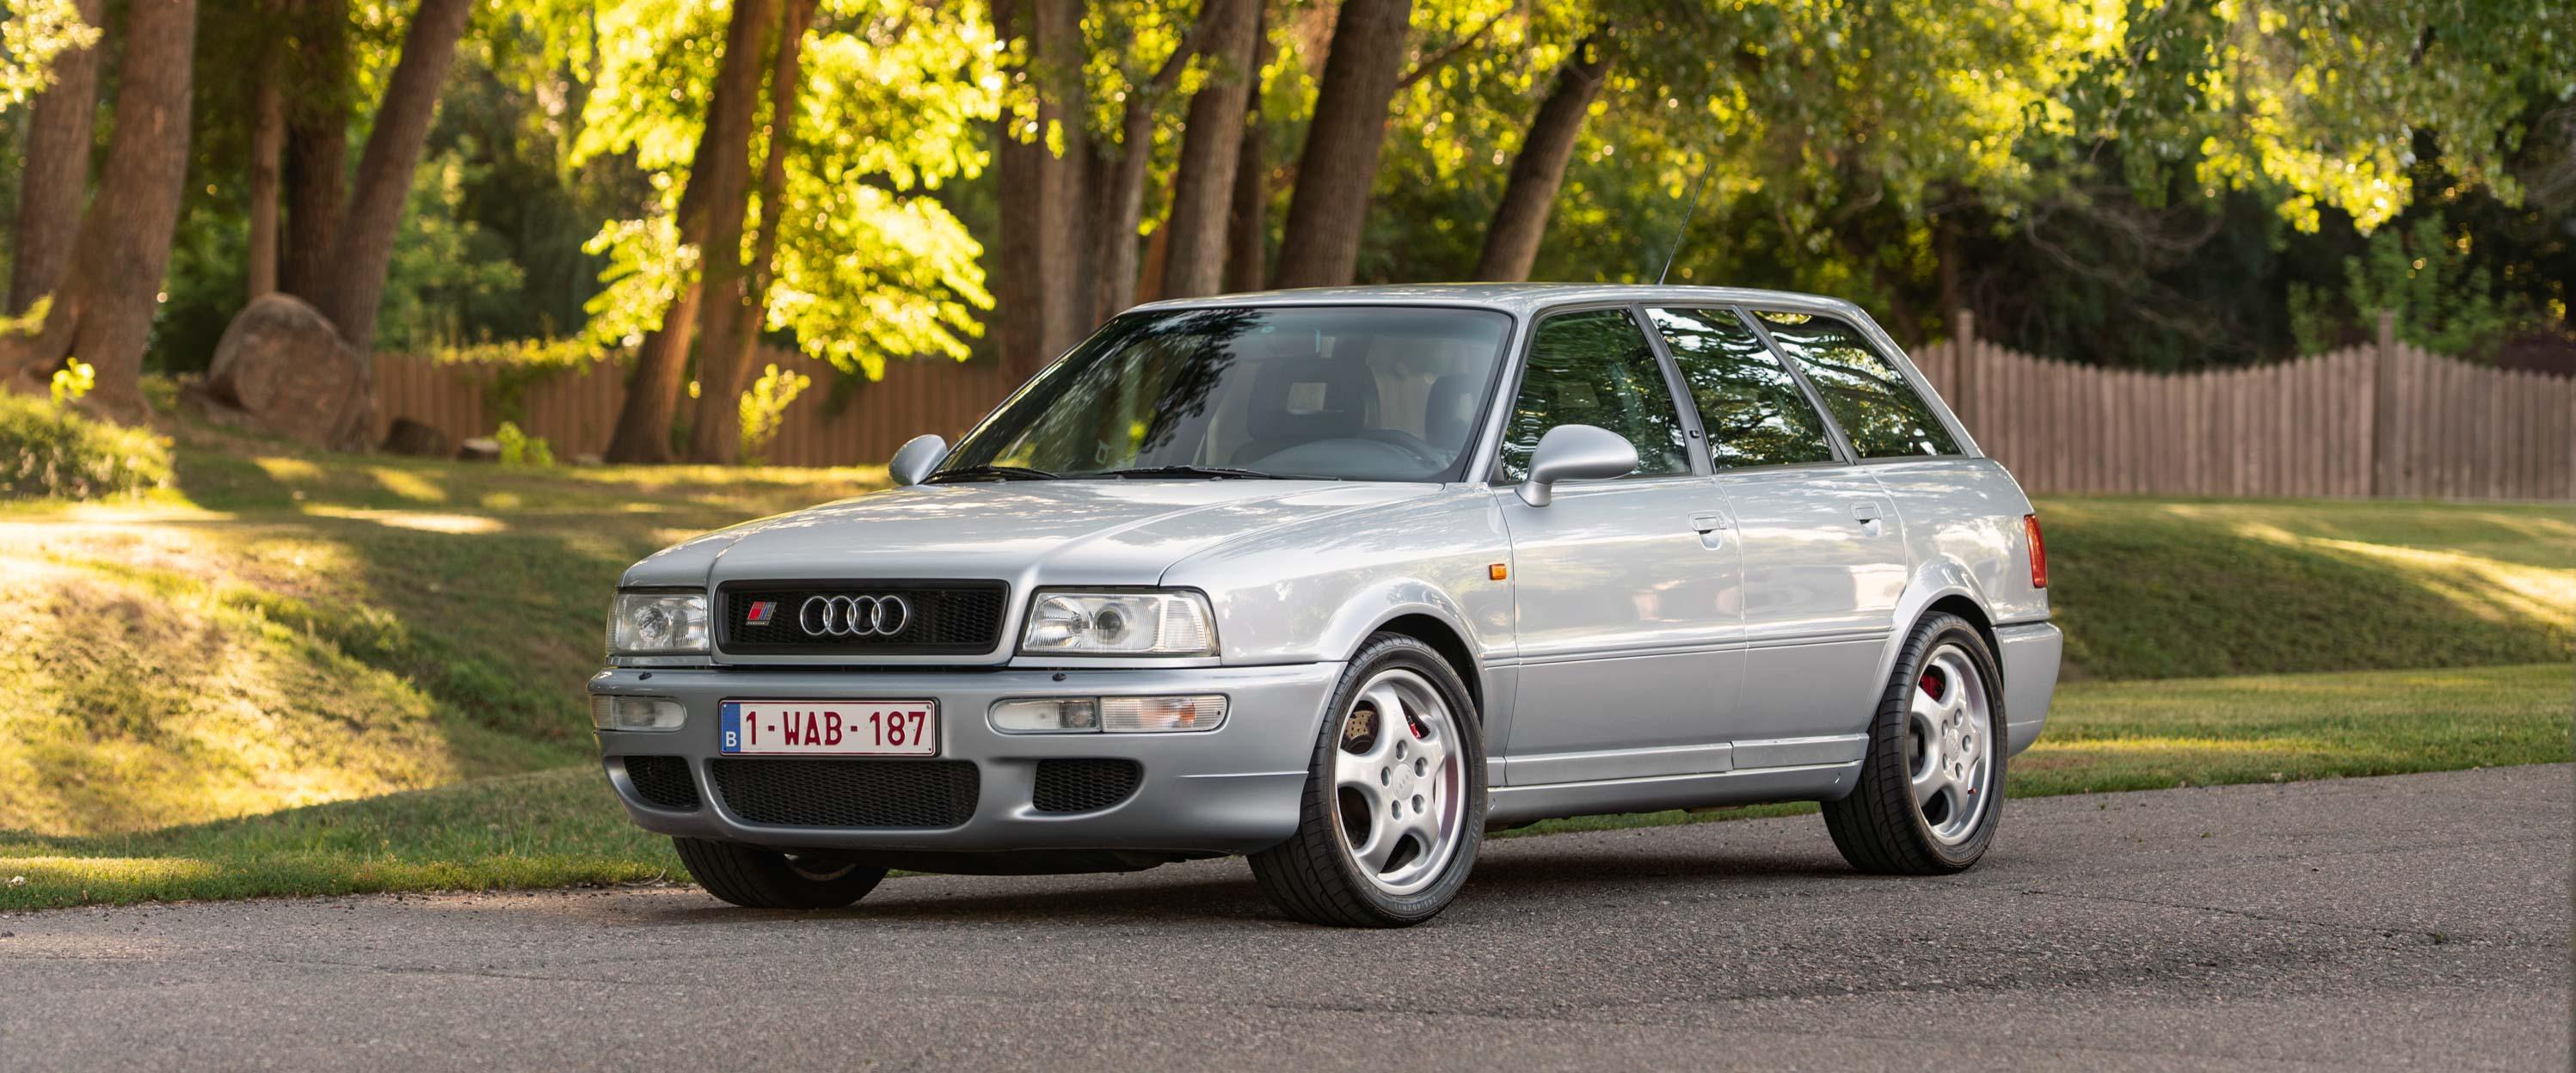 Audi RS2 1994 - Farland Classic Restoration